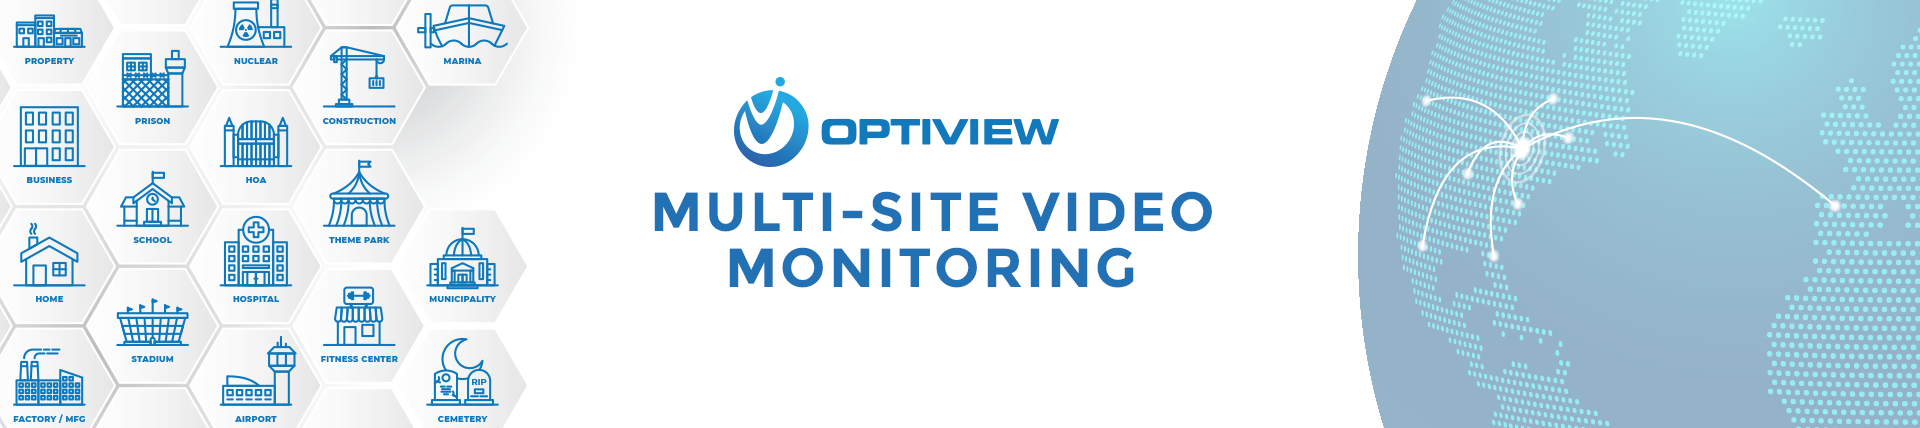 Free Multi Site Remote Monitoring Software